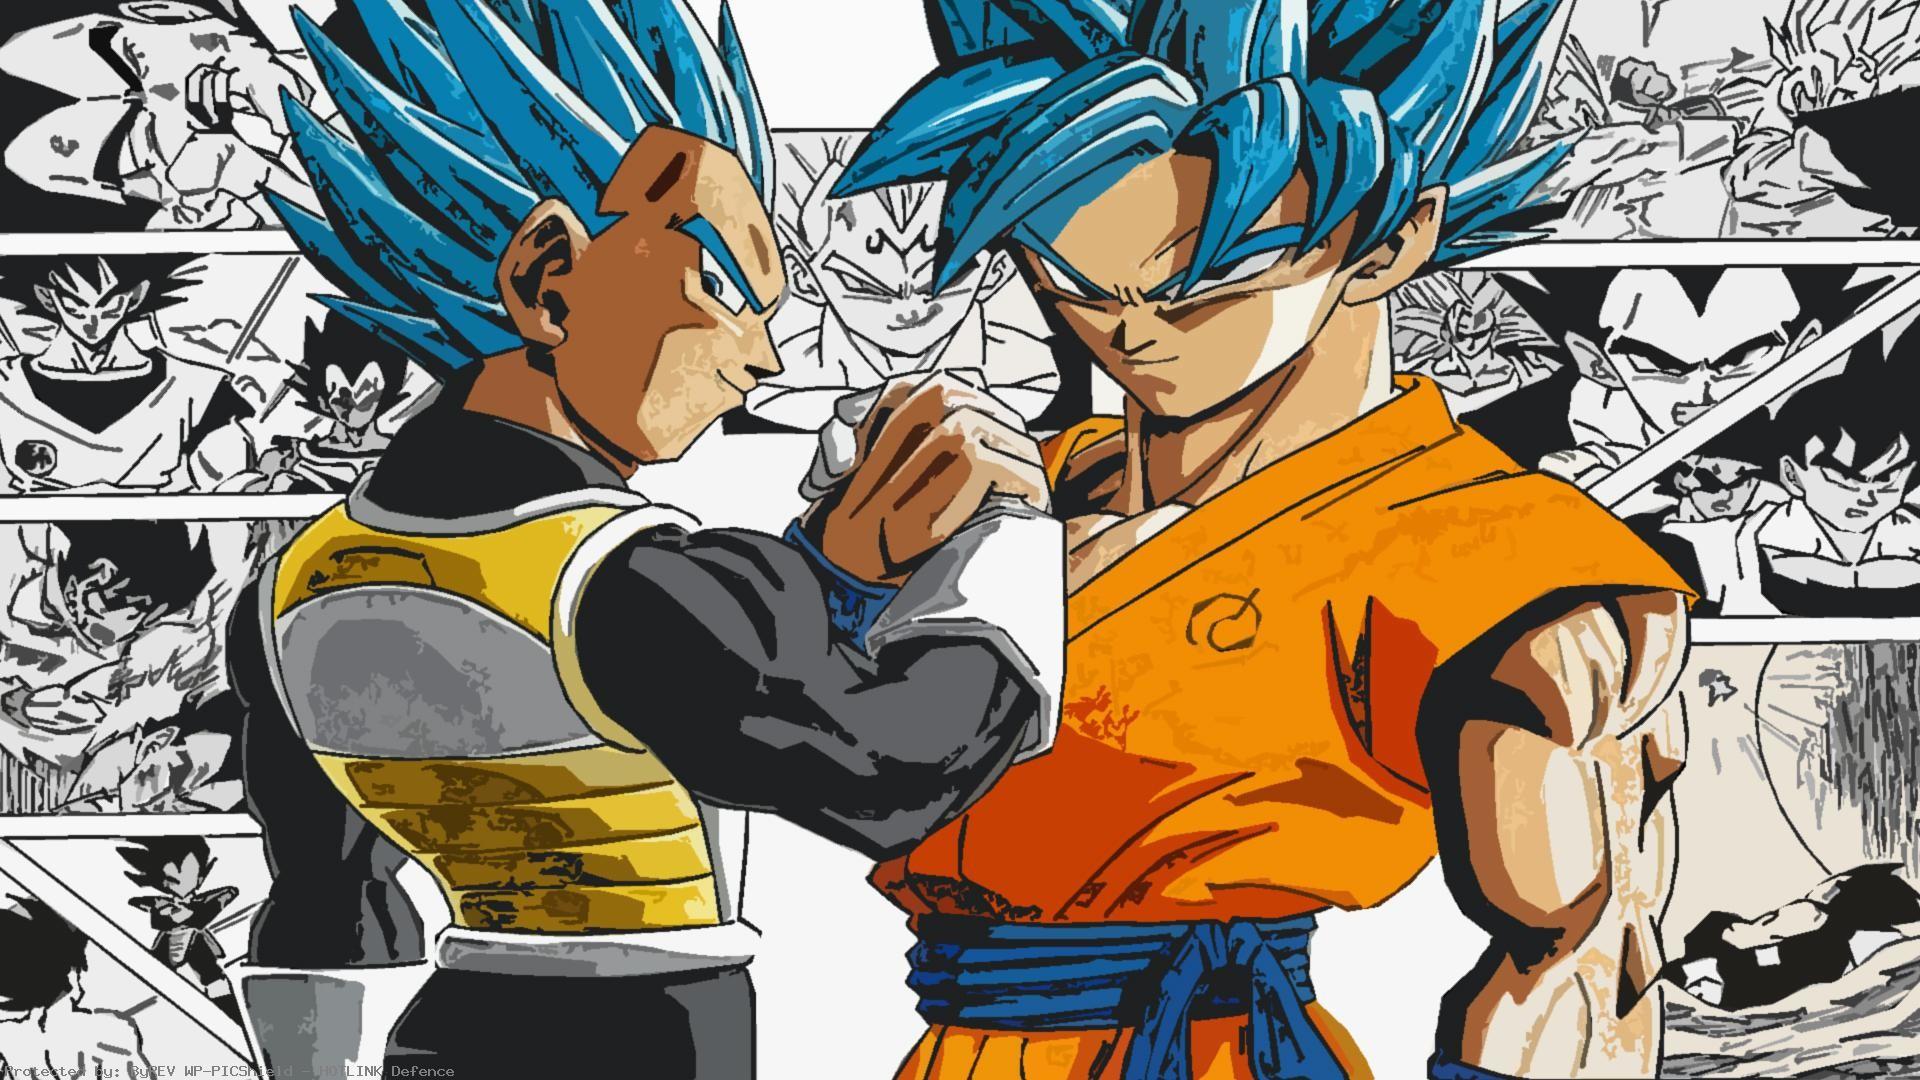 Super-Saiyan-Blue-Goku-and-Vegeta-1920×1080-Need-